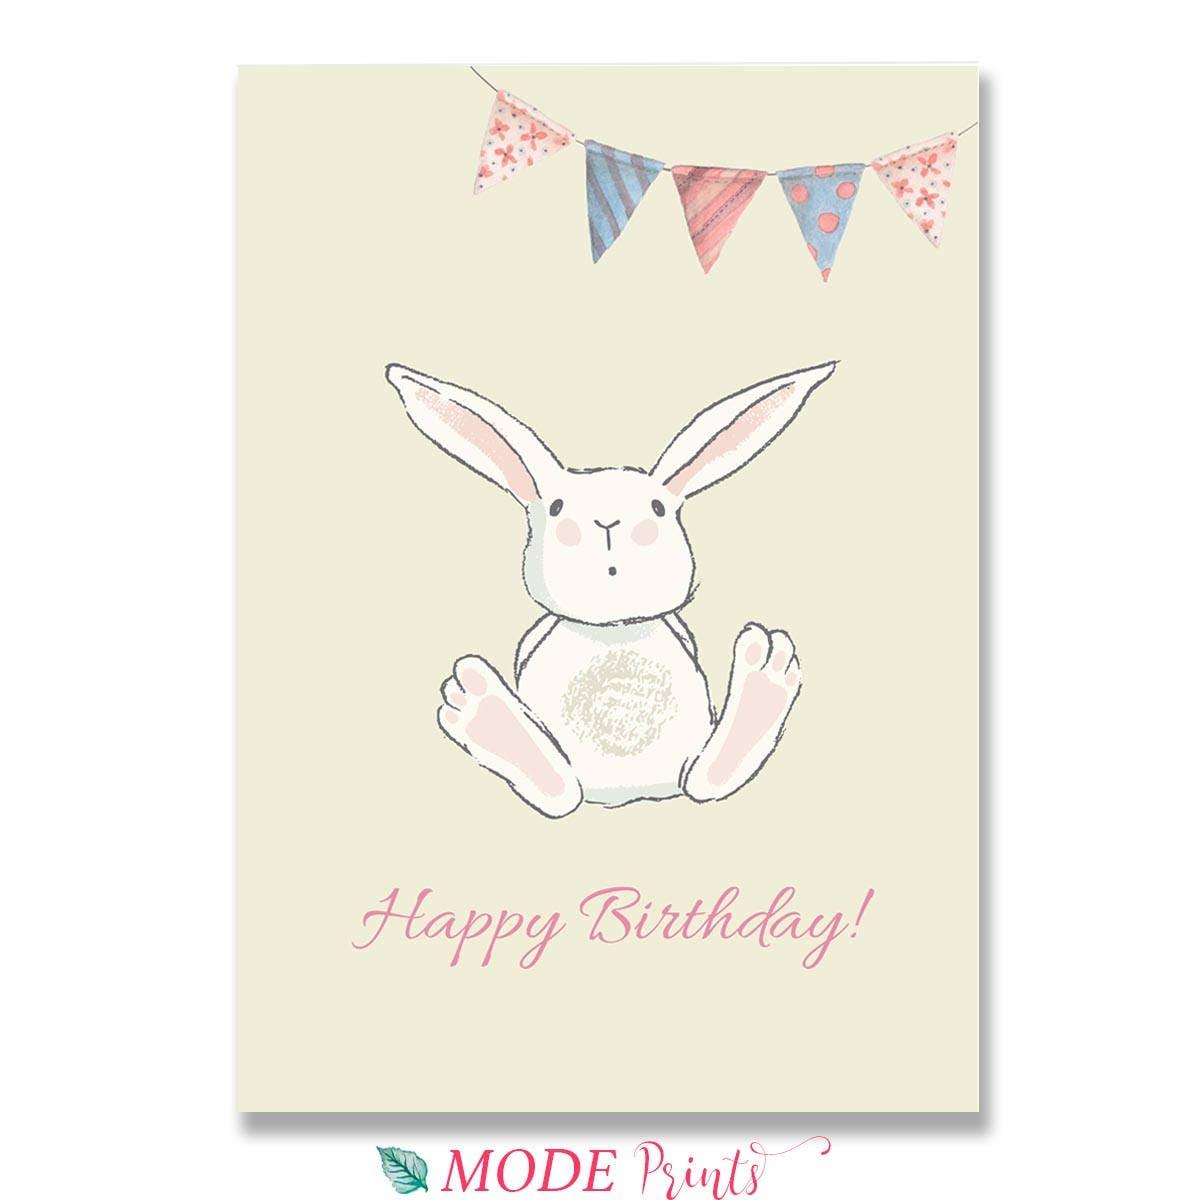 Happy Birthday Card Blue Pink Unisex Bunny Birthday Card For